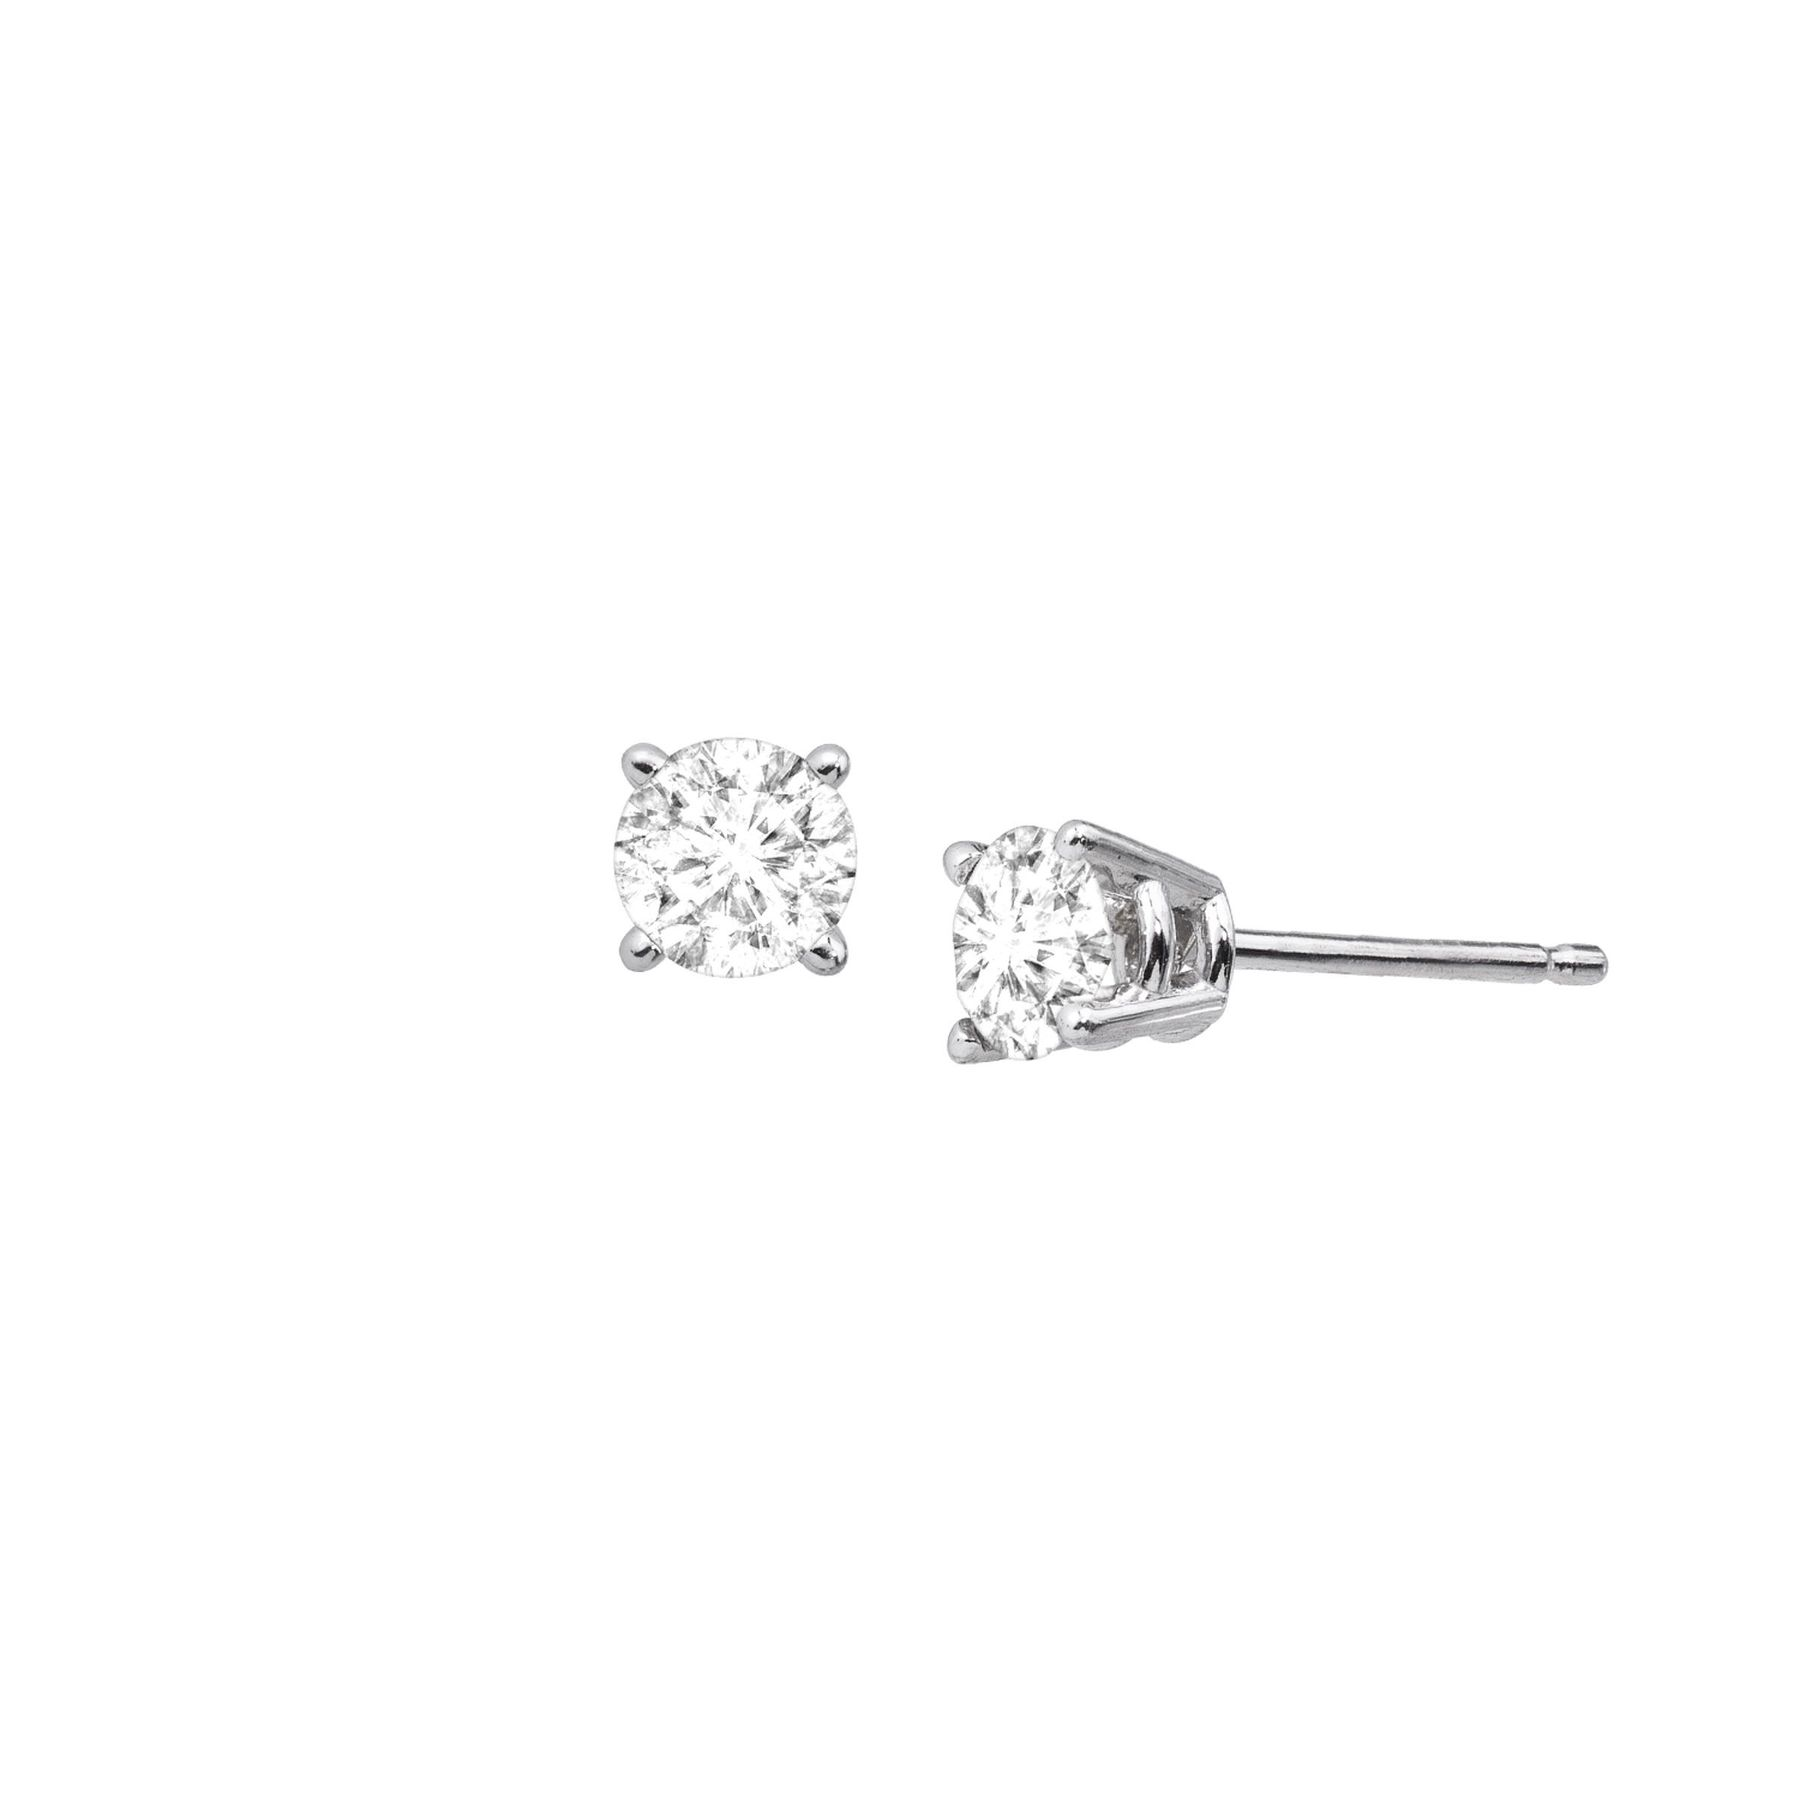 1 2 ct Diamond Stud Earrings in 14K White Gold  5fa504918f